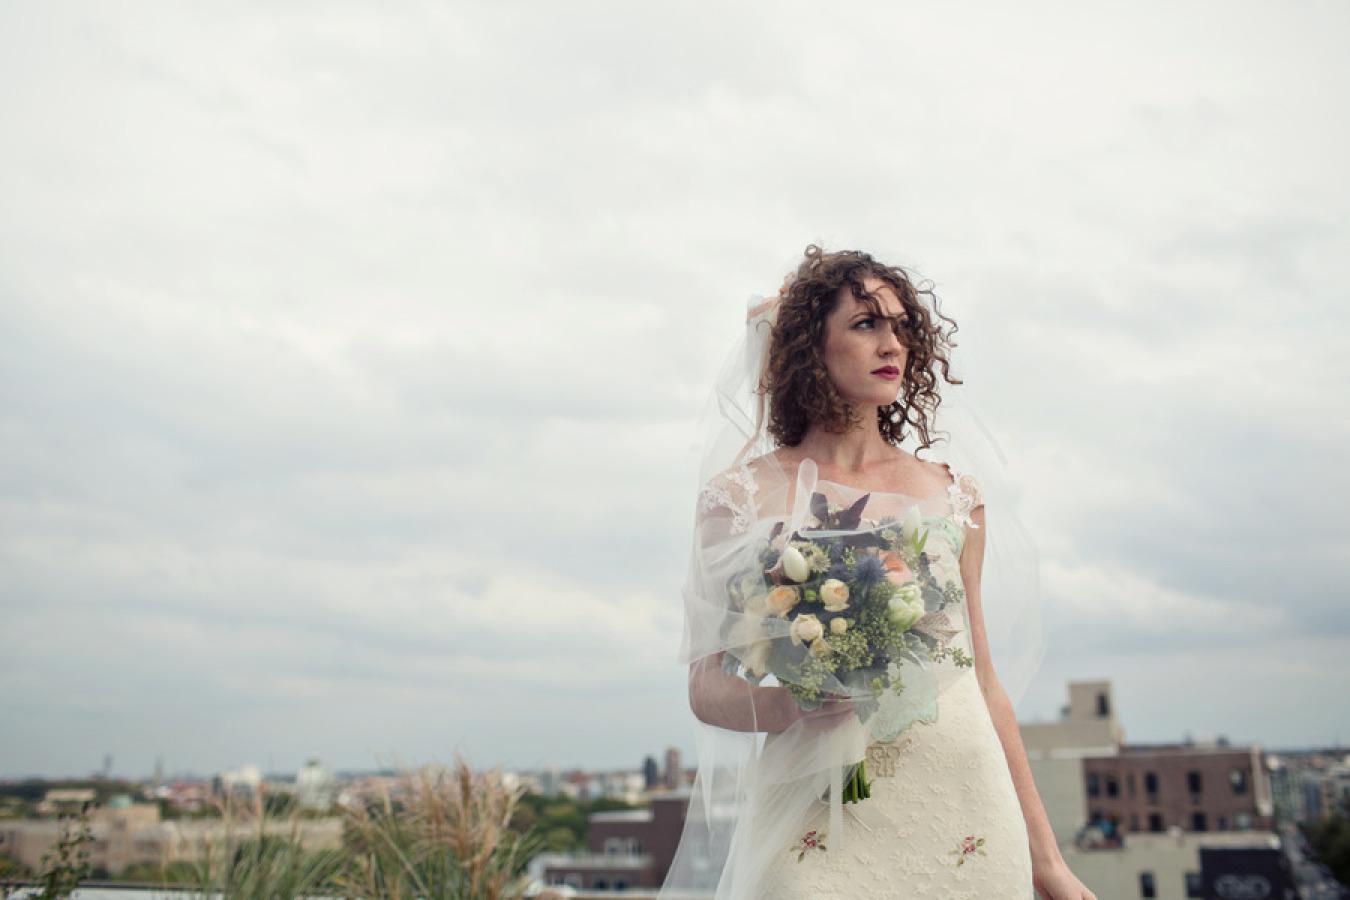 New York City Wedding from Heather Kincaid + Firefly Events